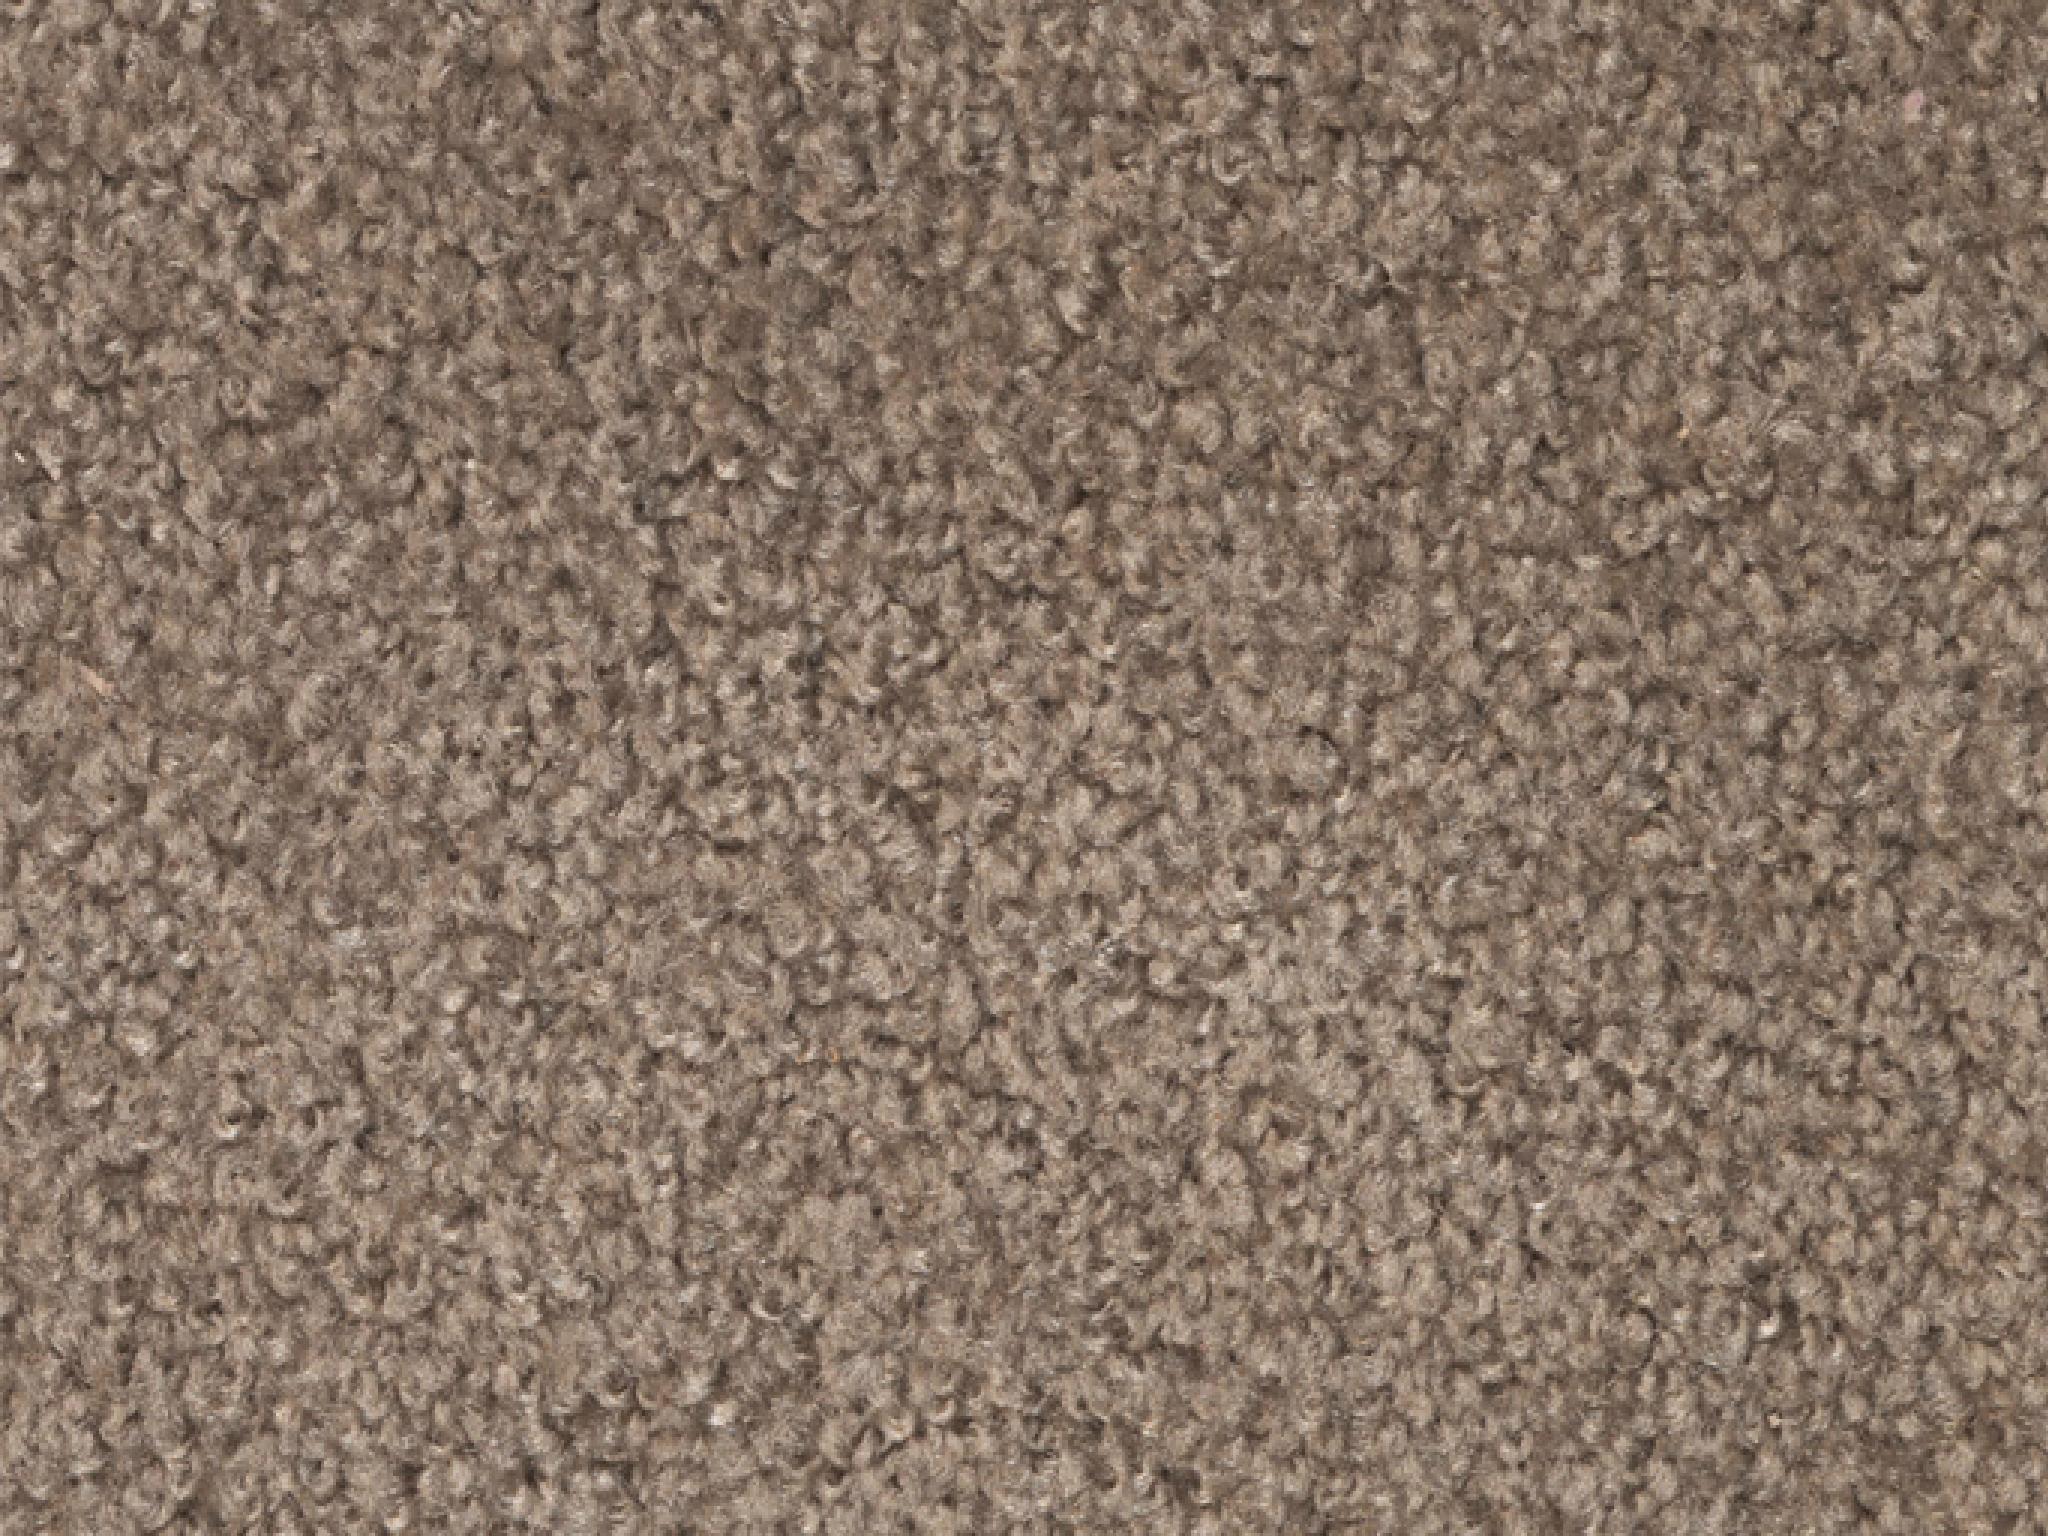 MAY_Decor_Carpet_Rockslide